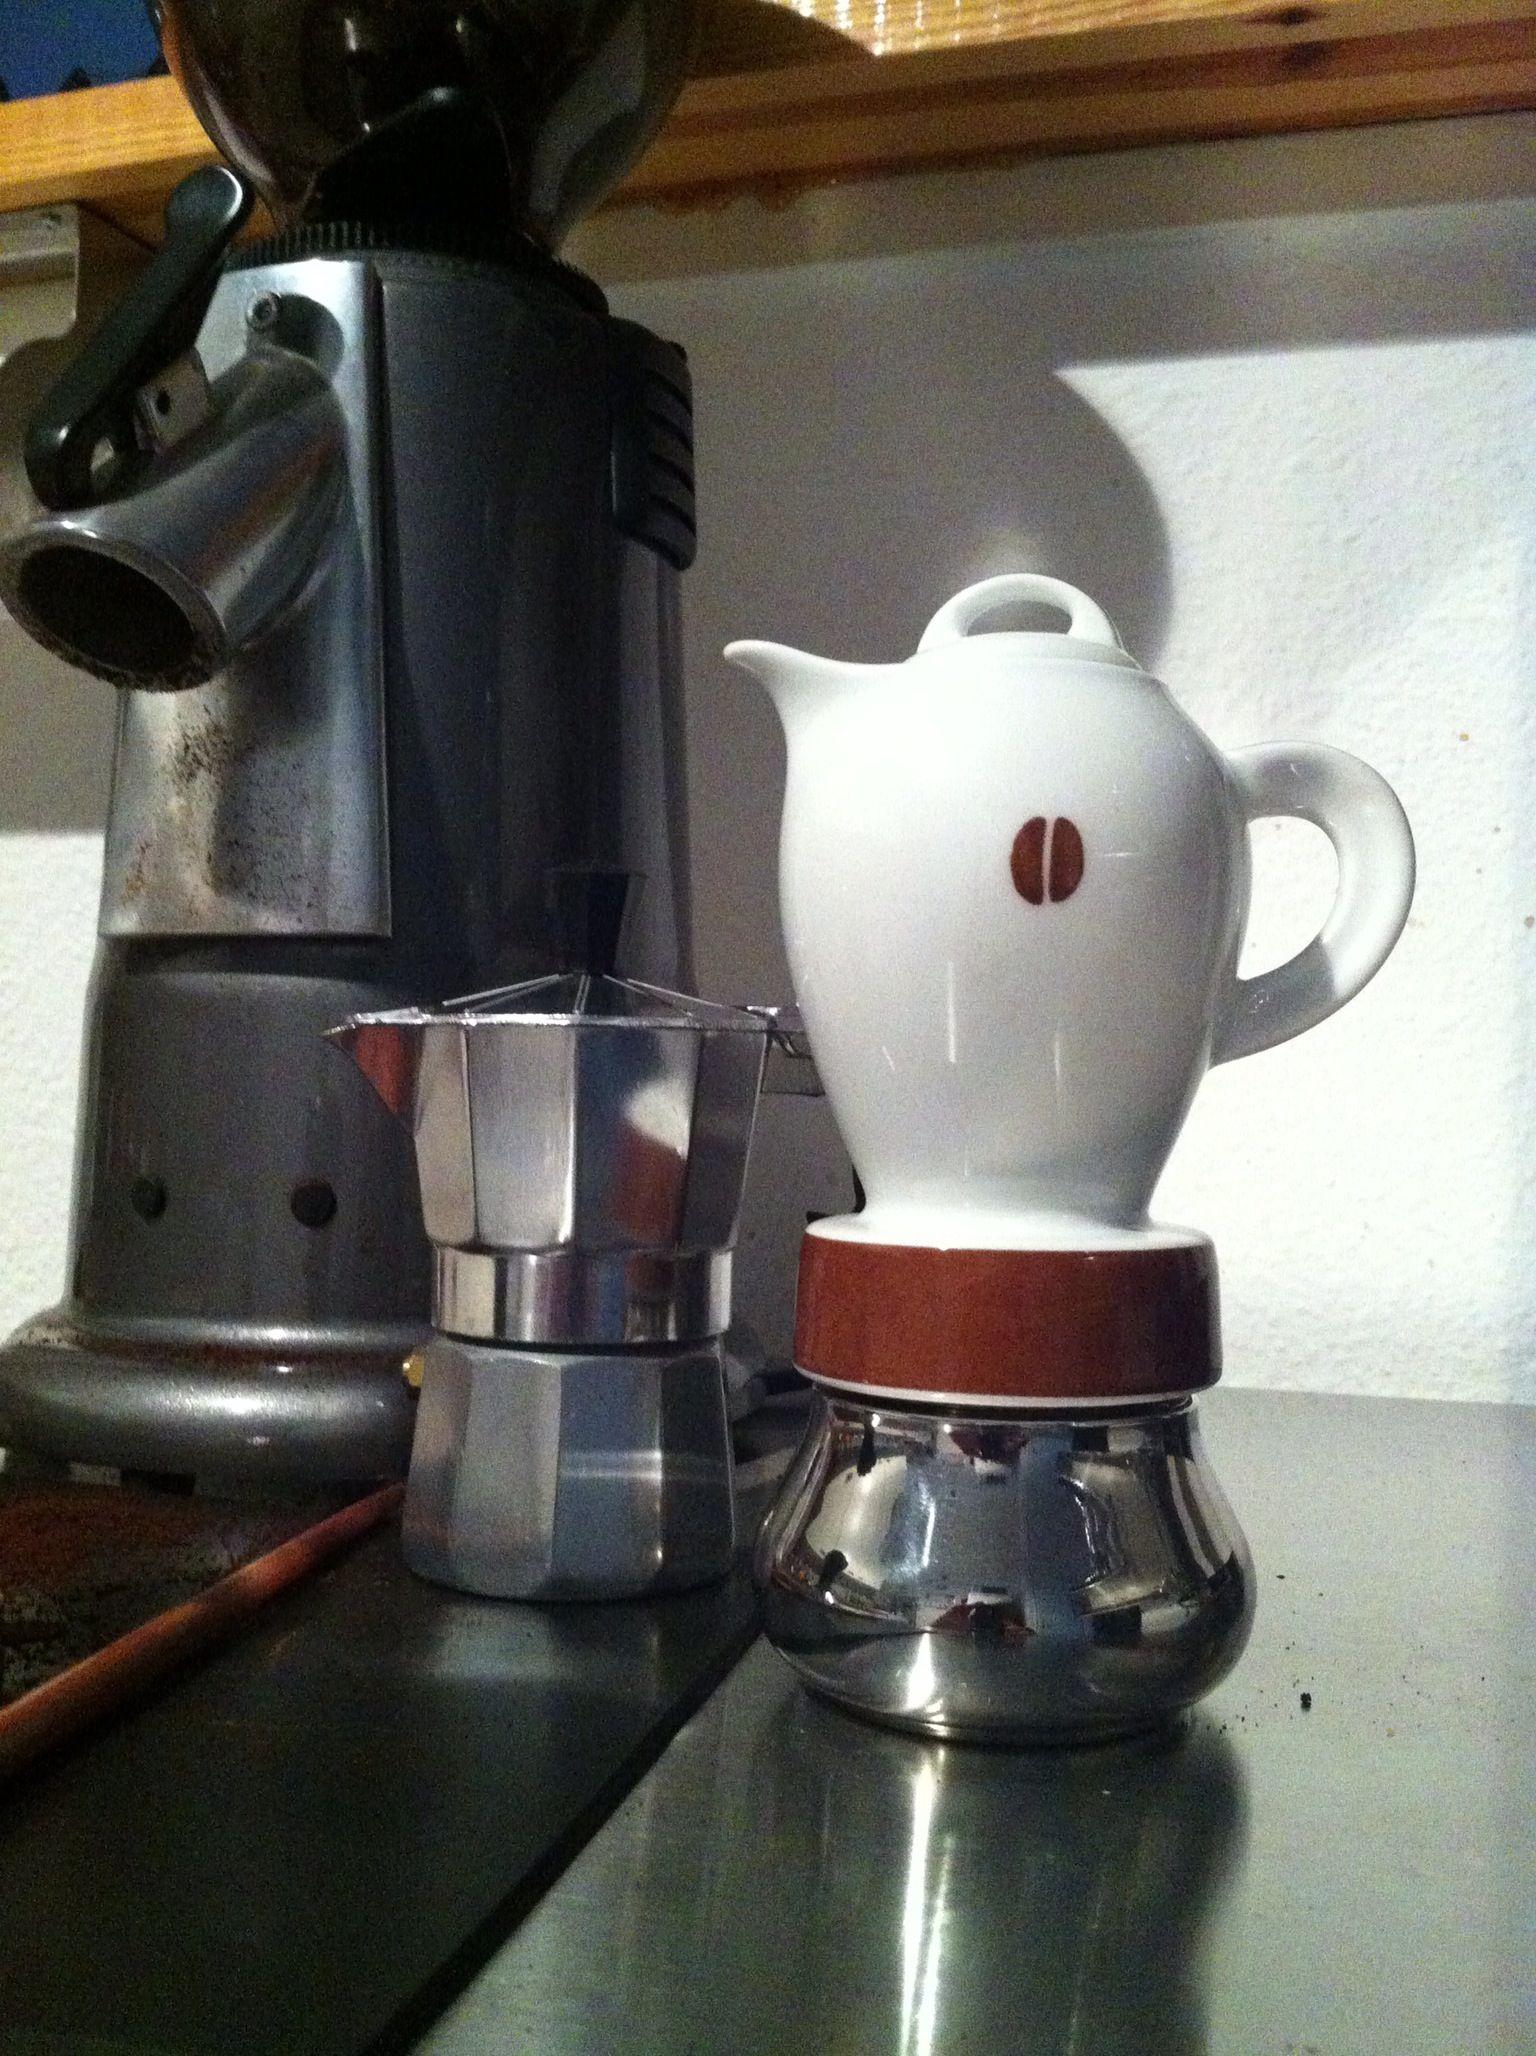 Le porcellane d'Ancap .. 2 moka coffee makers